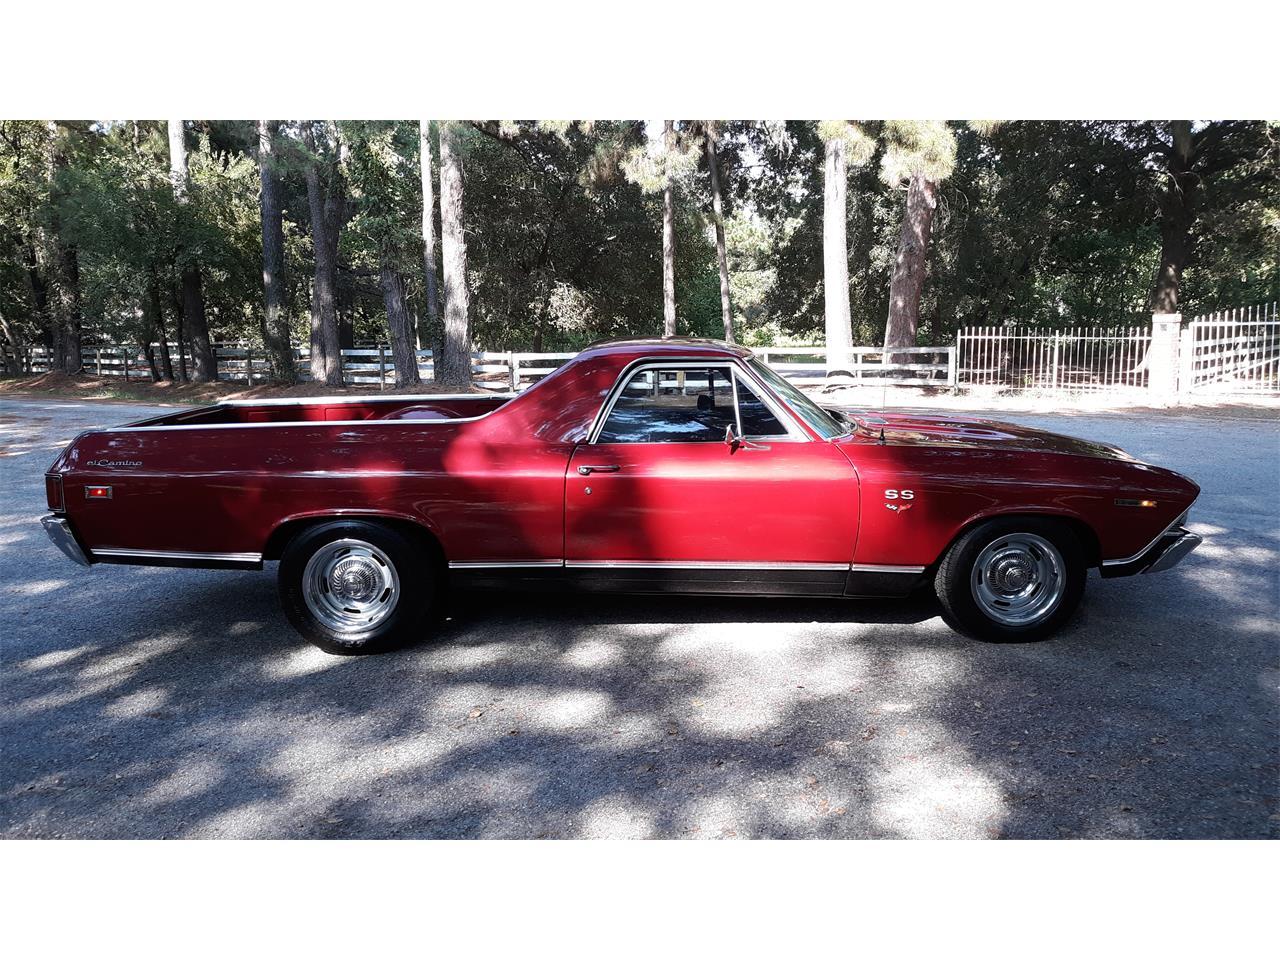 1969 Chevrolet El Camino SS (CC-1256569) for sale in Cypress, Texas